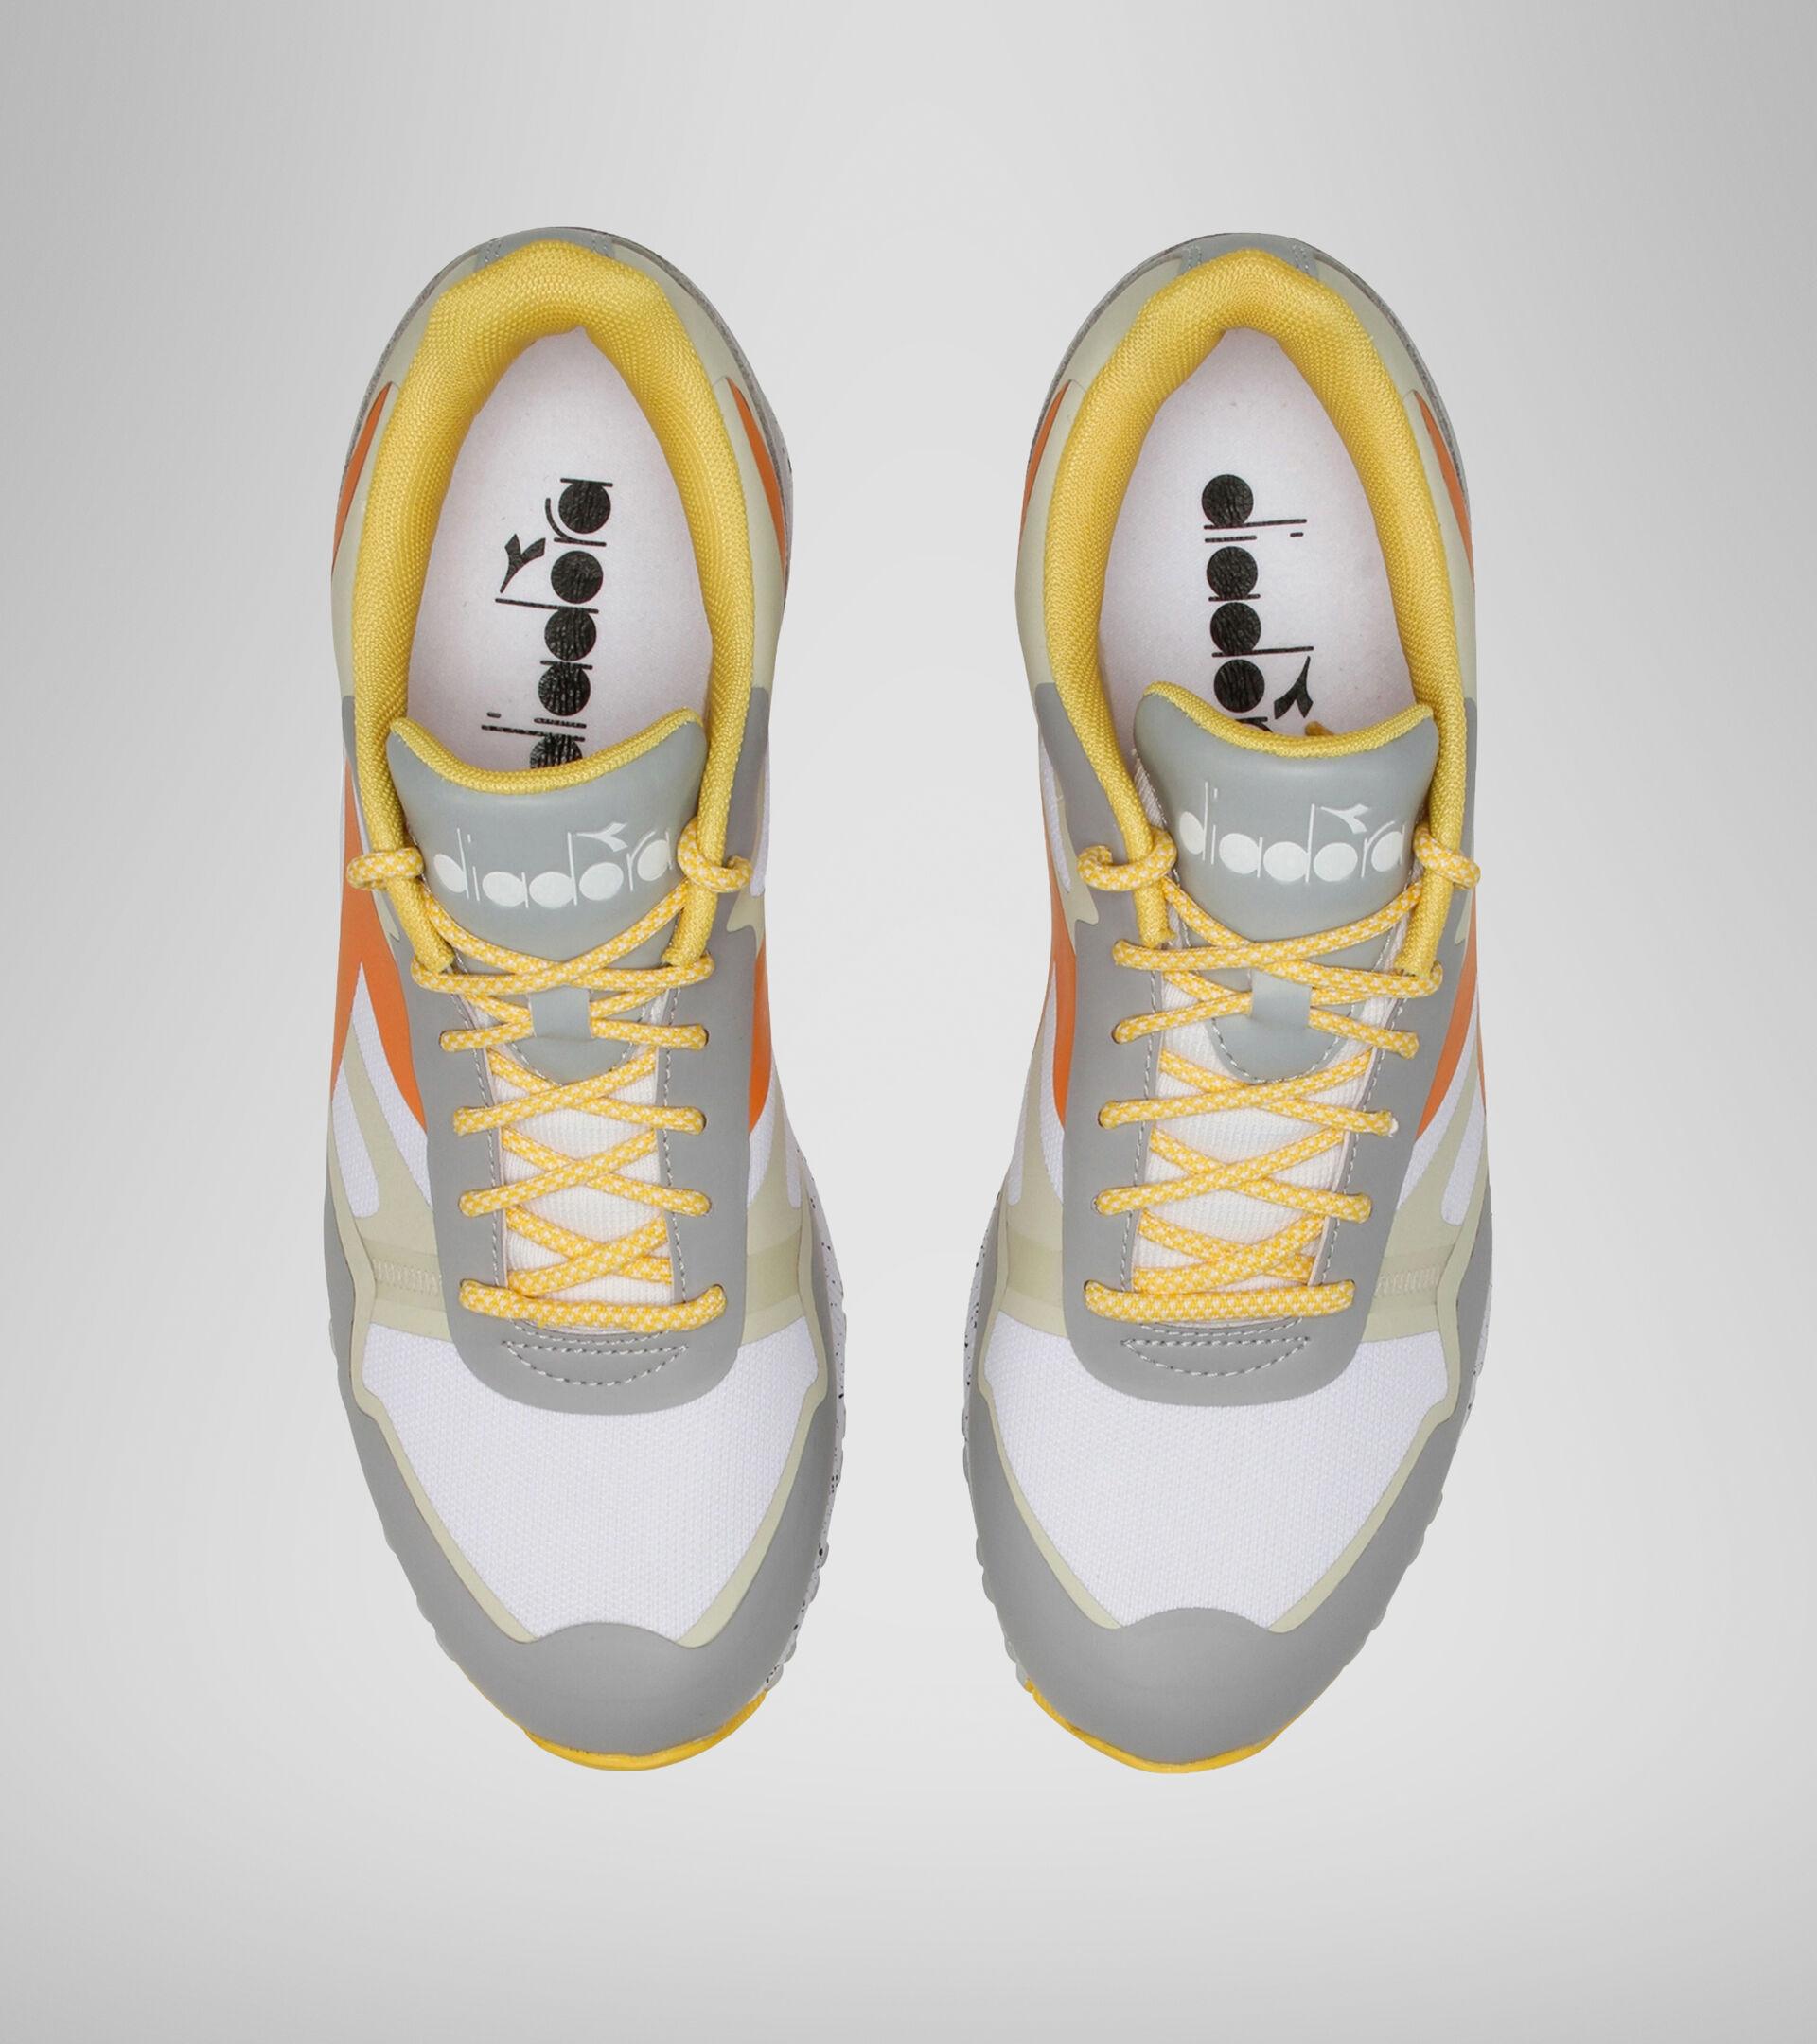 Footwear Sportswear UOMO N902 OUTDOOR GR.NEVE/BE.OSTRICA/AR.RUGGINE Diadora